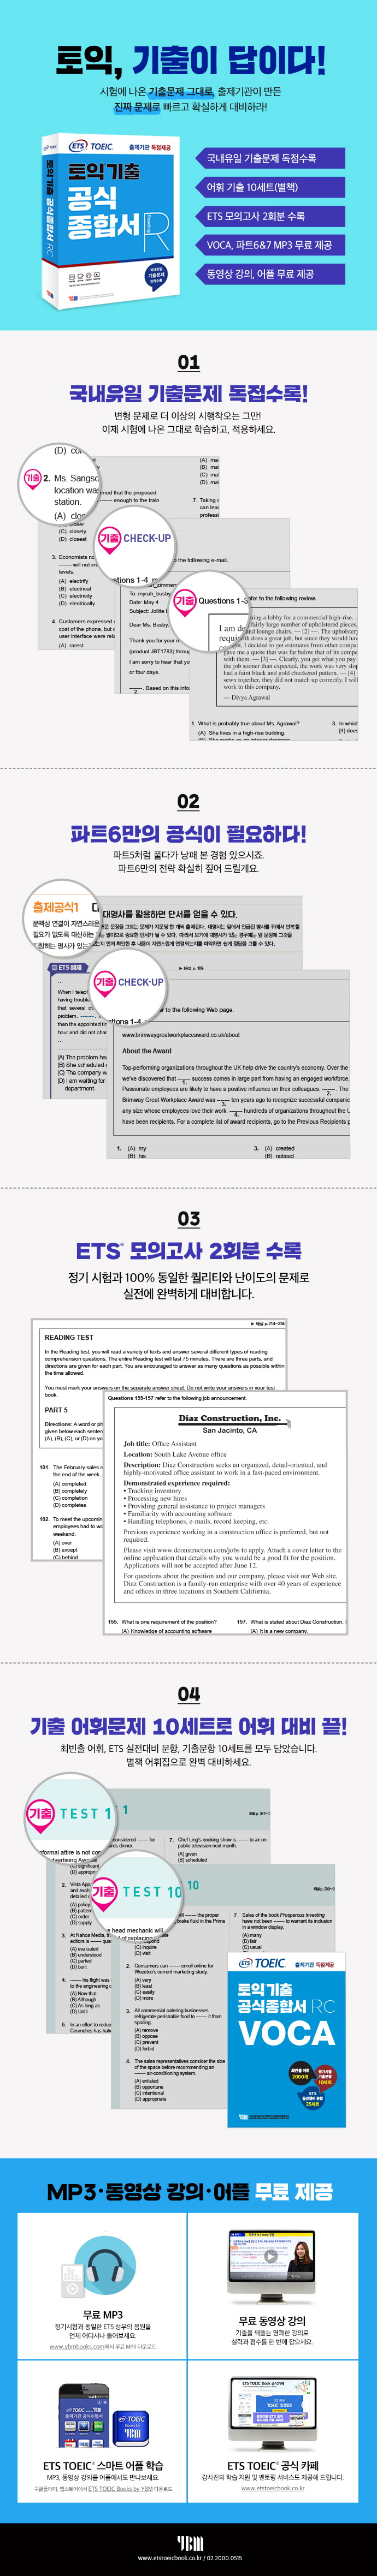 ETS 토익기출 공식종합서 RC 도서 상세이미지